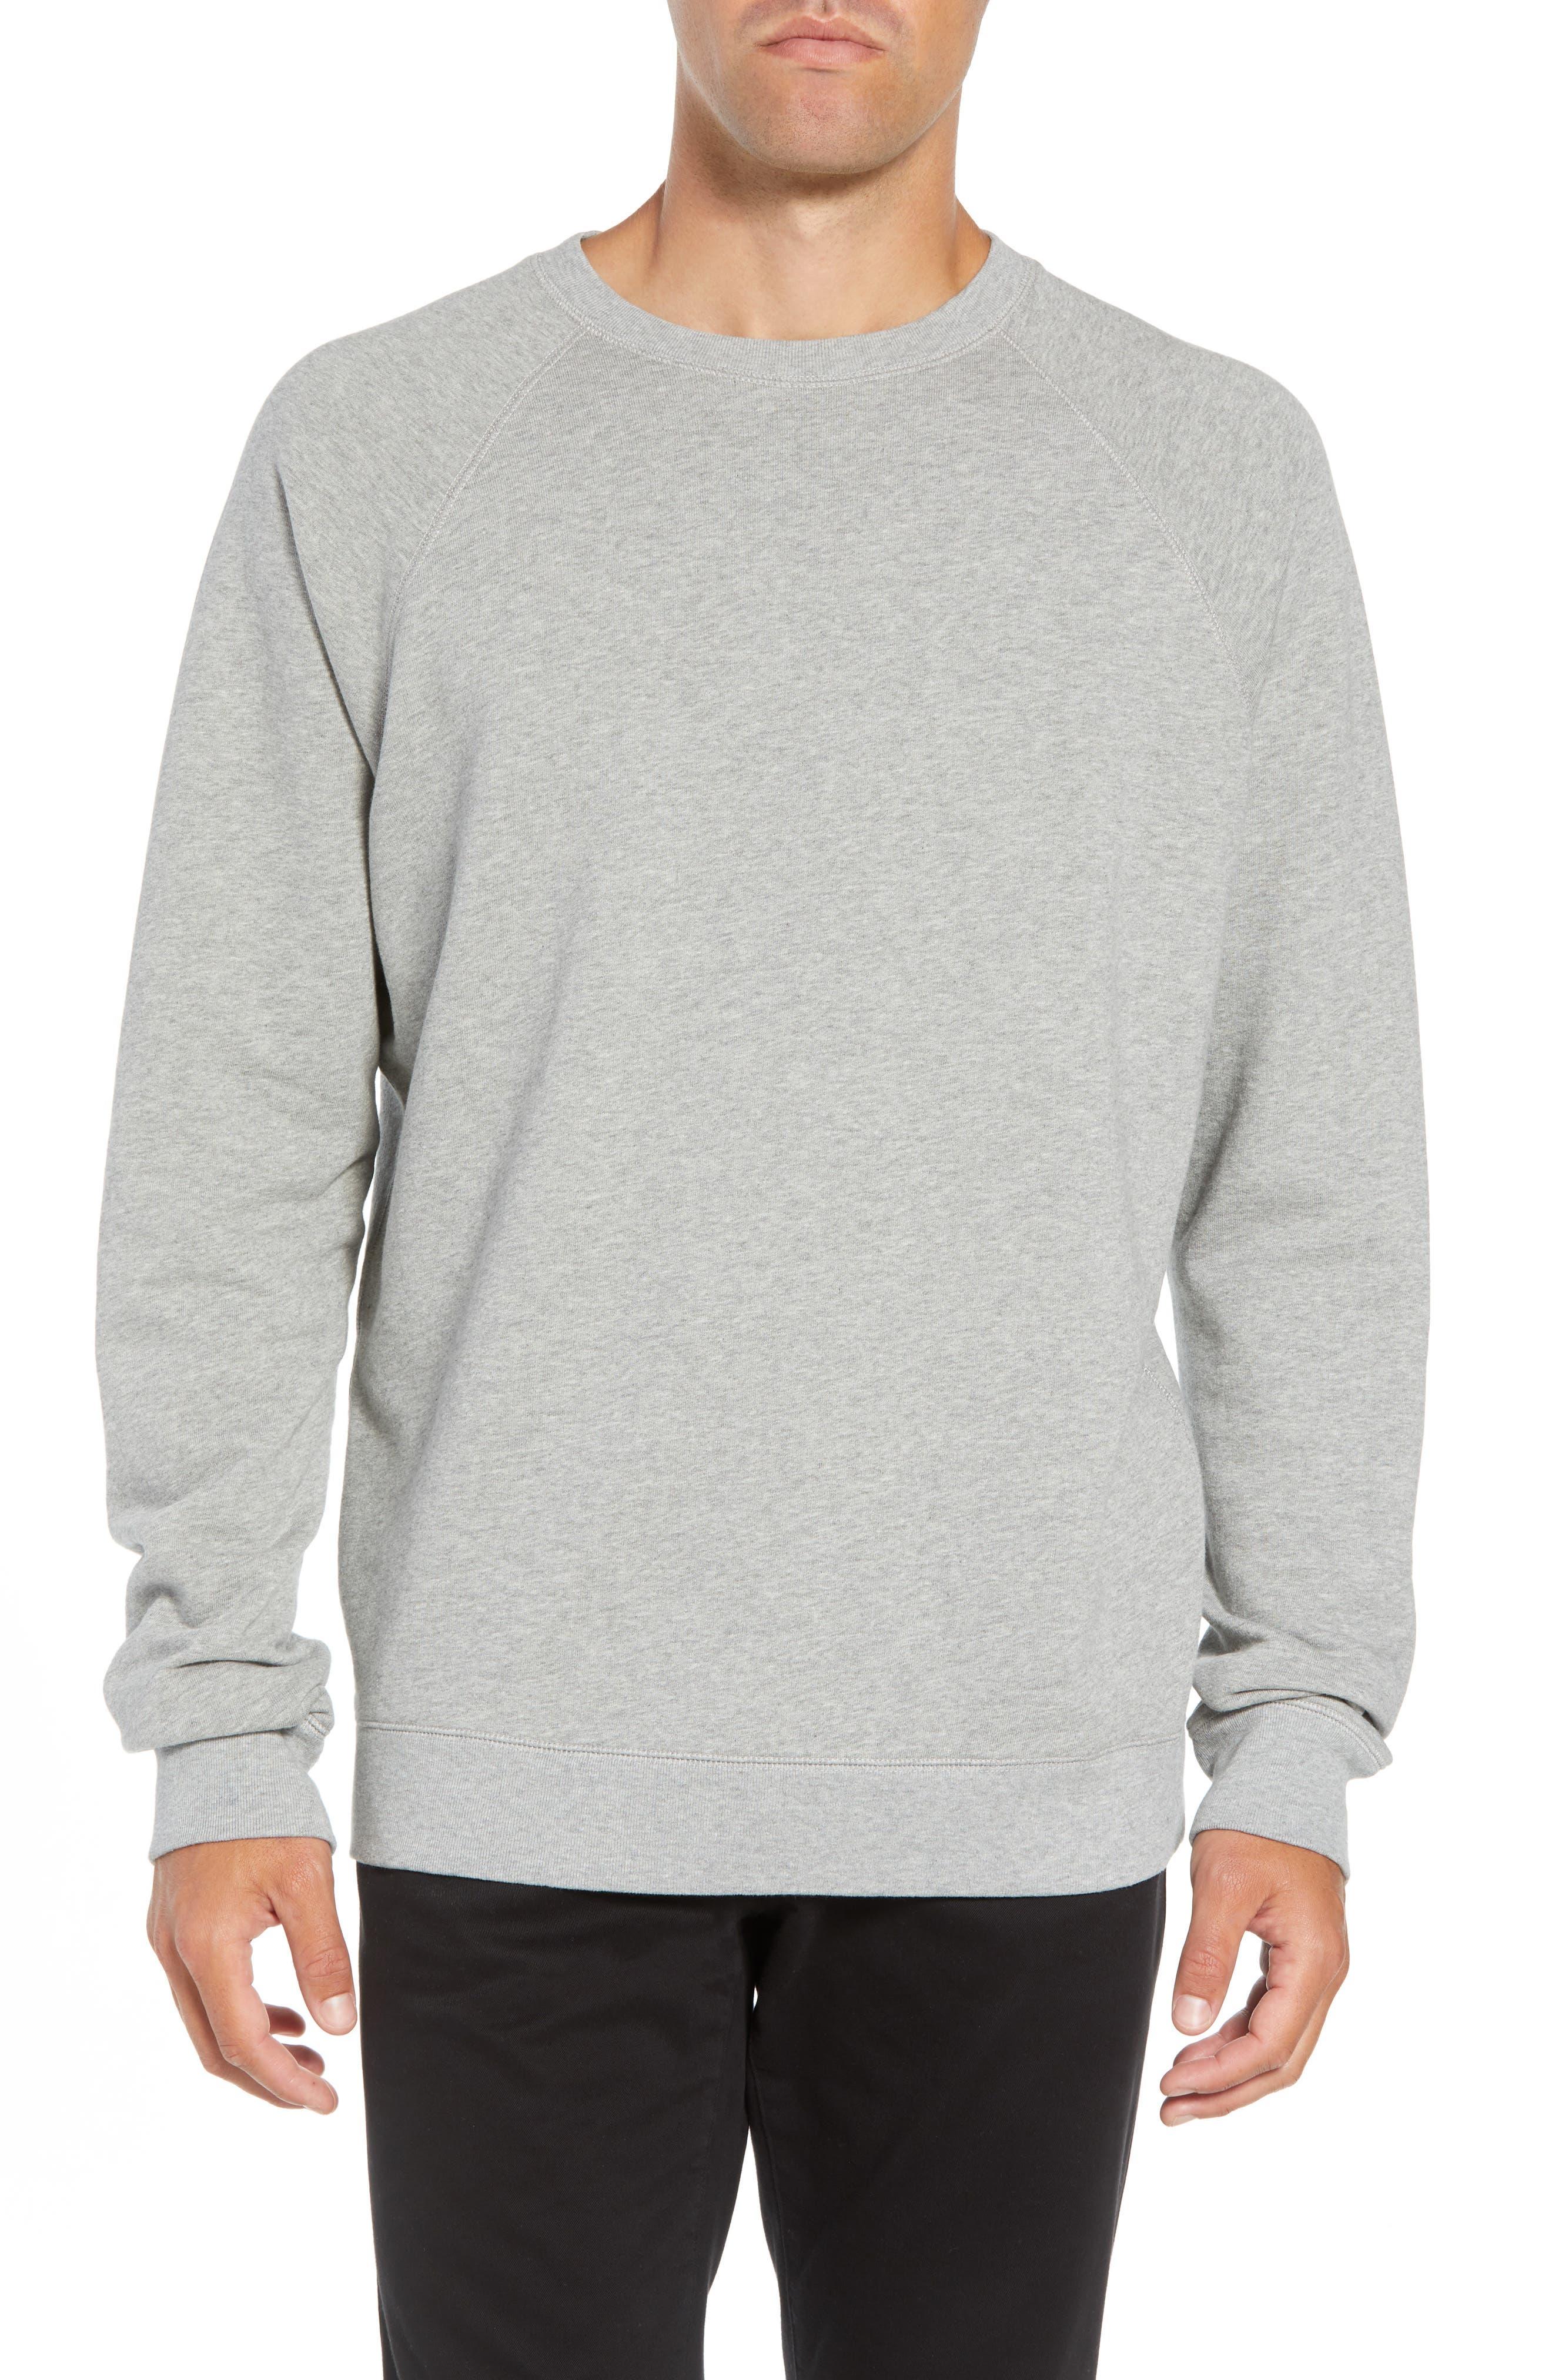 Aim French Terry Raglan Sweatshirt,                             Main thumbnail 1, color,                             GREY MELANGE